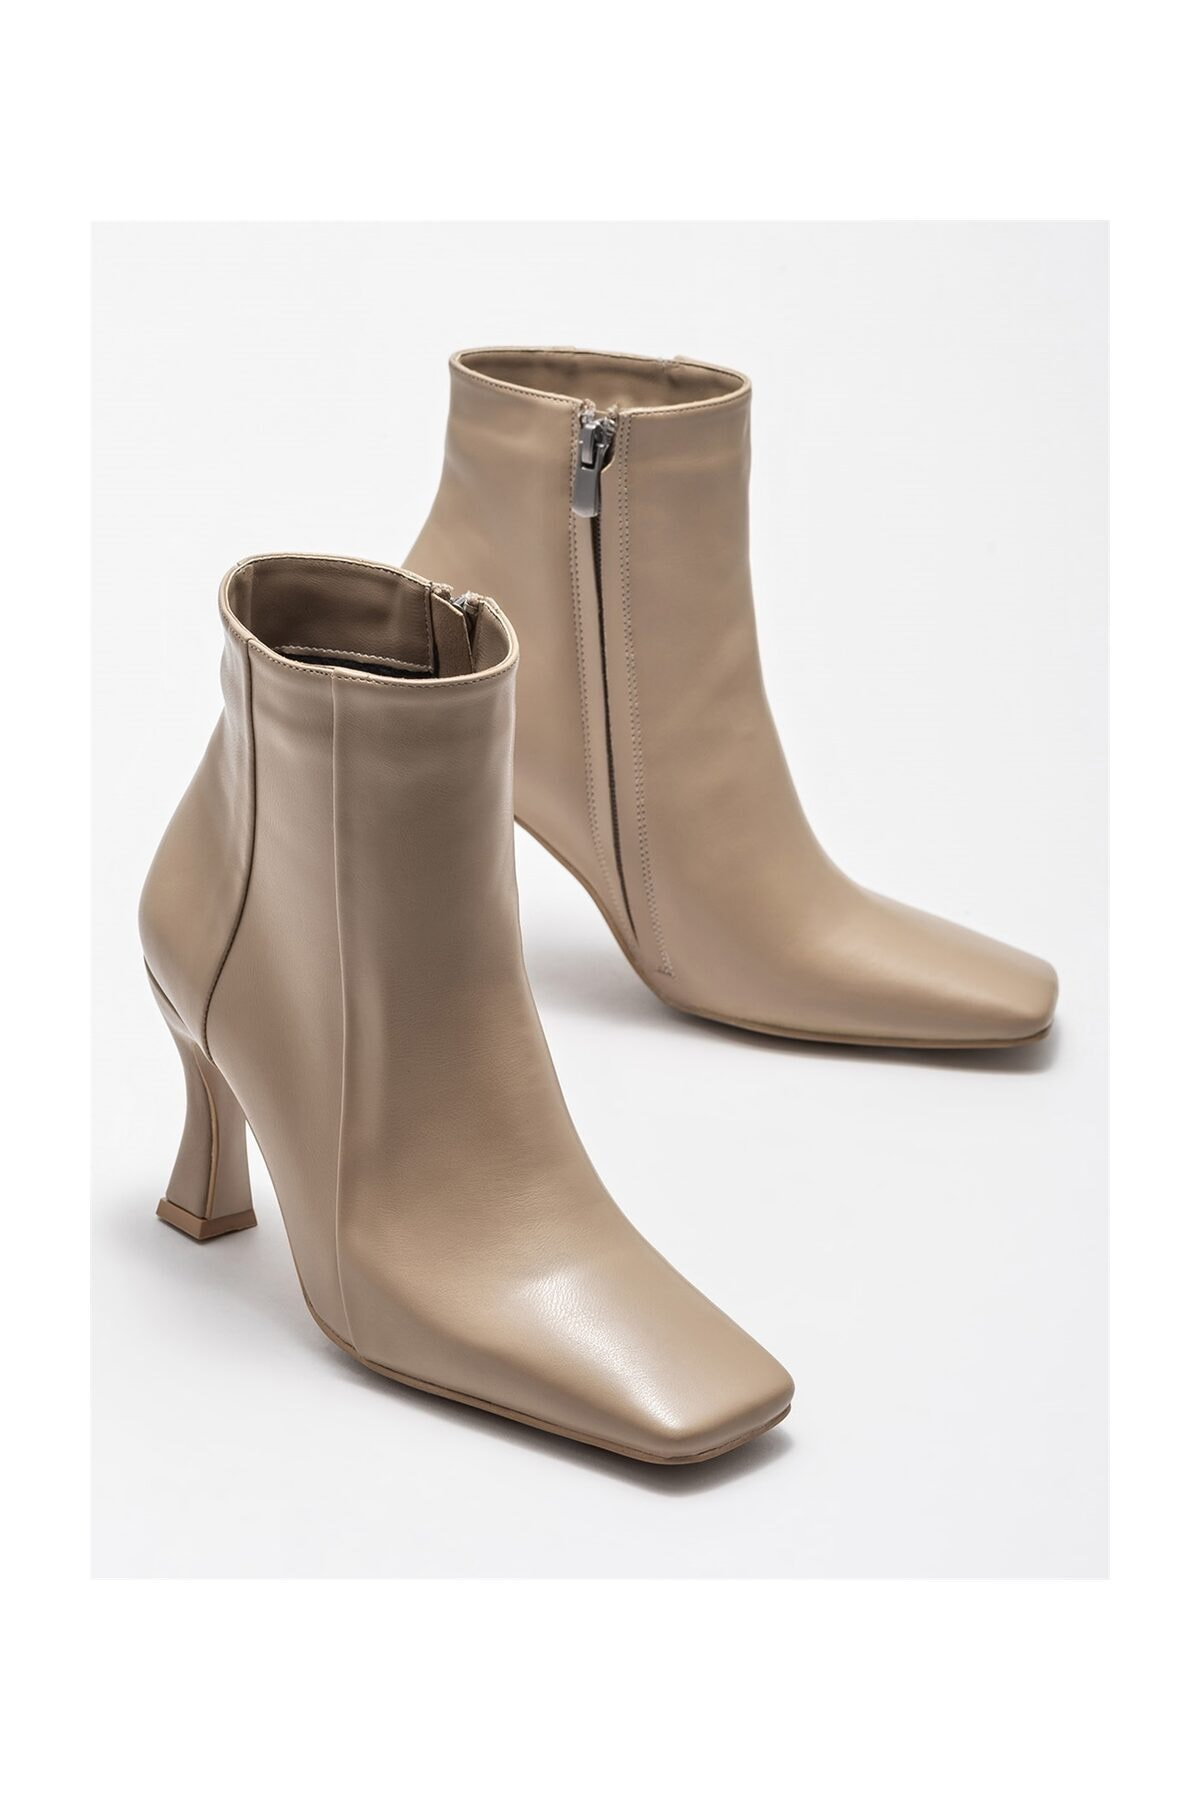 Elle Shoes Bot & Bootie RONSONAS 20KSM815 2